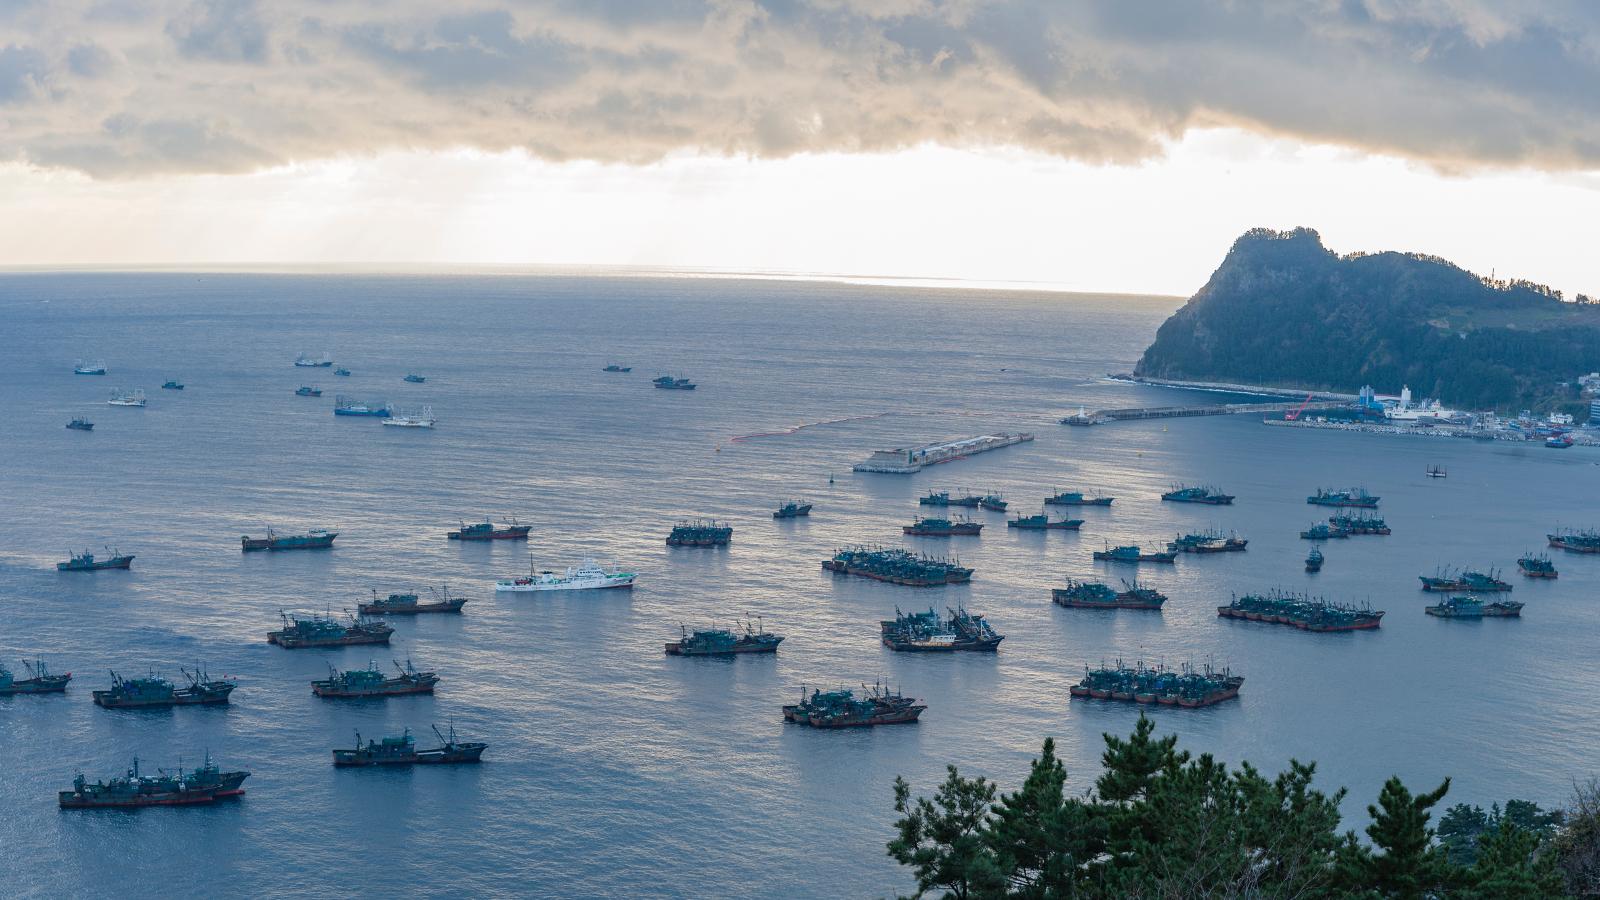 Ecuador beunruhigt wegen hunderter chinesischer Fischerboote vor Galápagos-Inseln